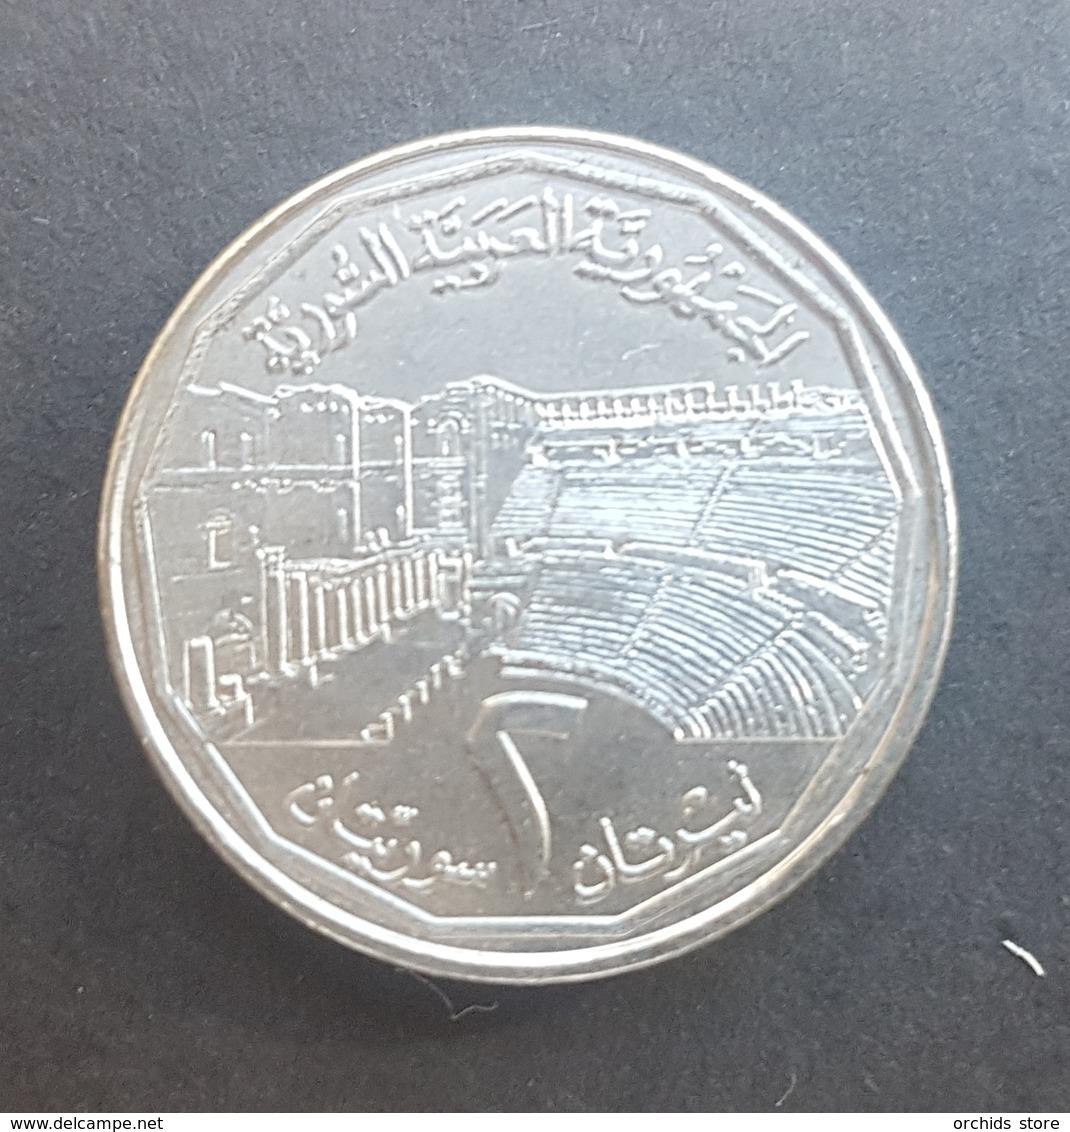 HX - Syria 1996 2 Livres Coin A-UNC / UNC - Syrie